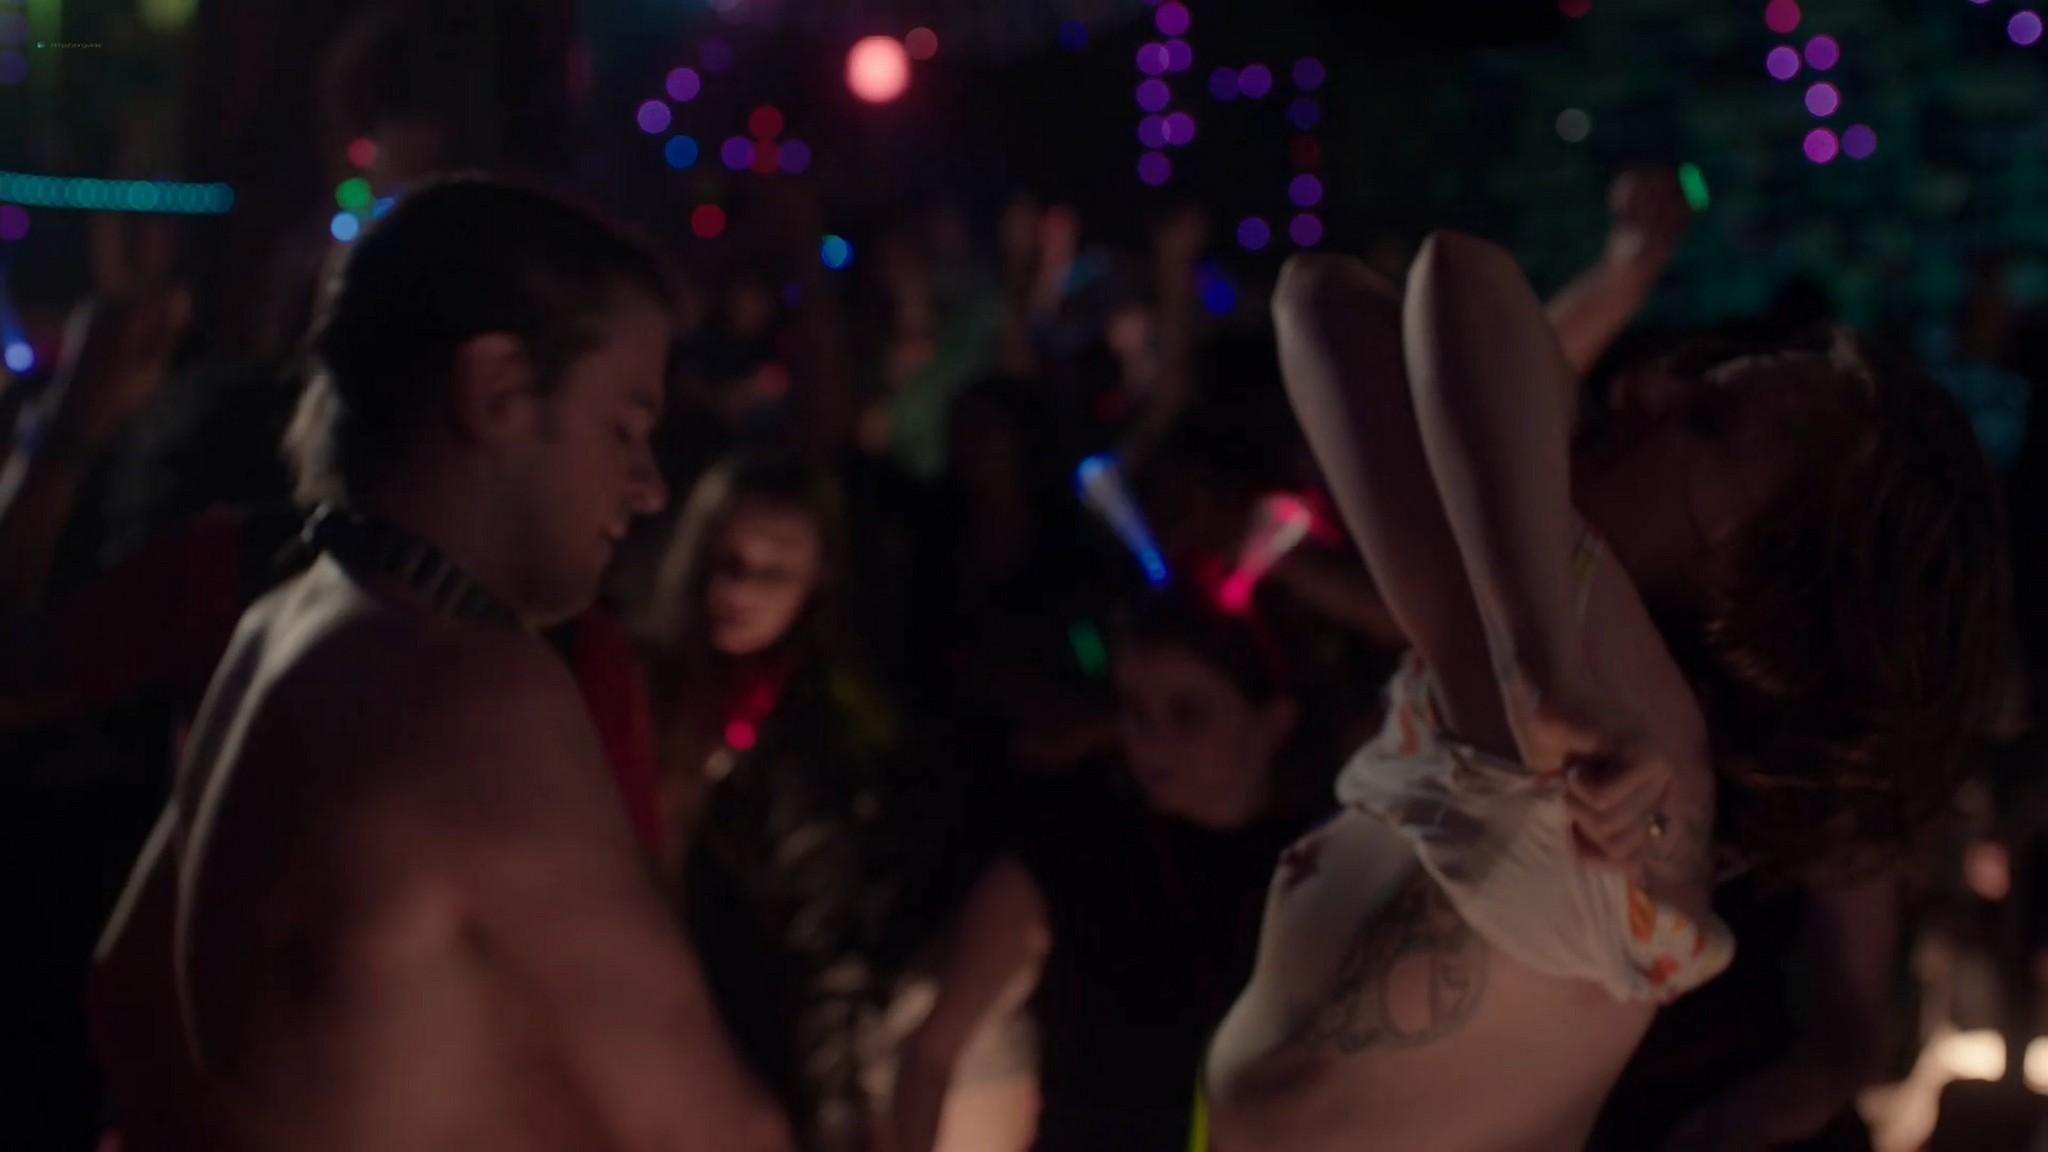 Allison Williams sex Lena Dunham nude Zosia Mamet hot Jemima Kirke nude Girls 2012 s2e1 5 1080p Web 5